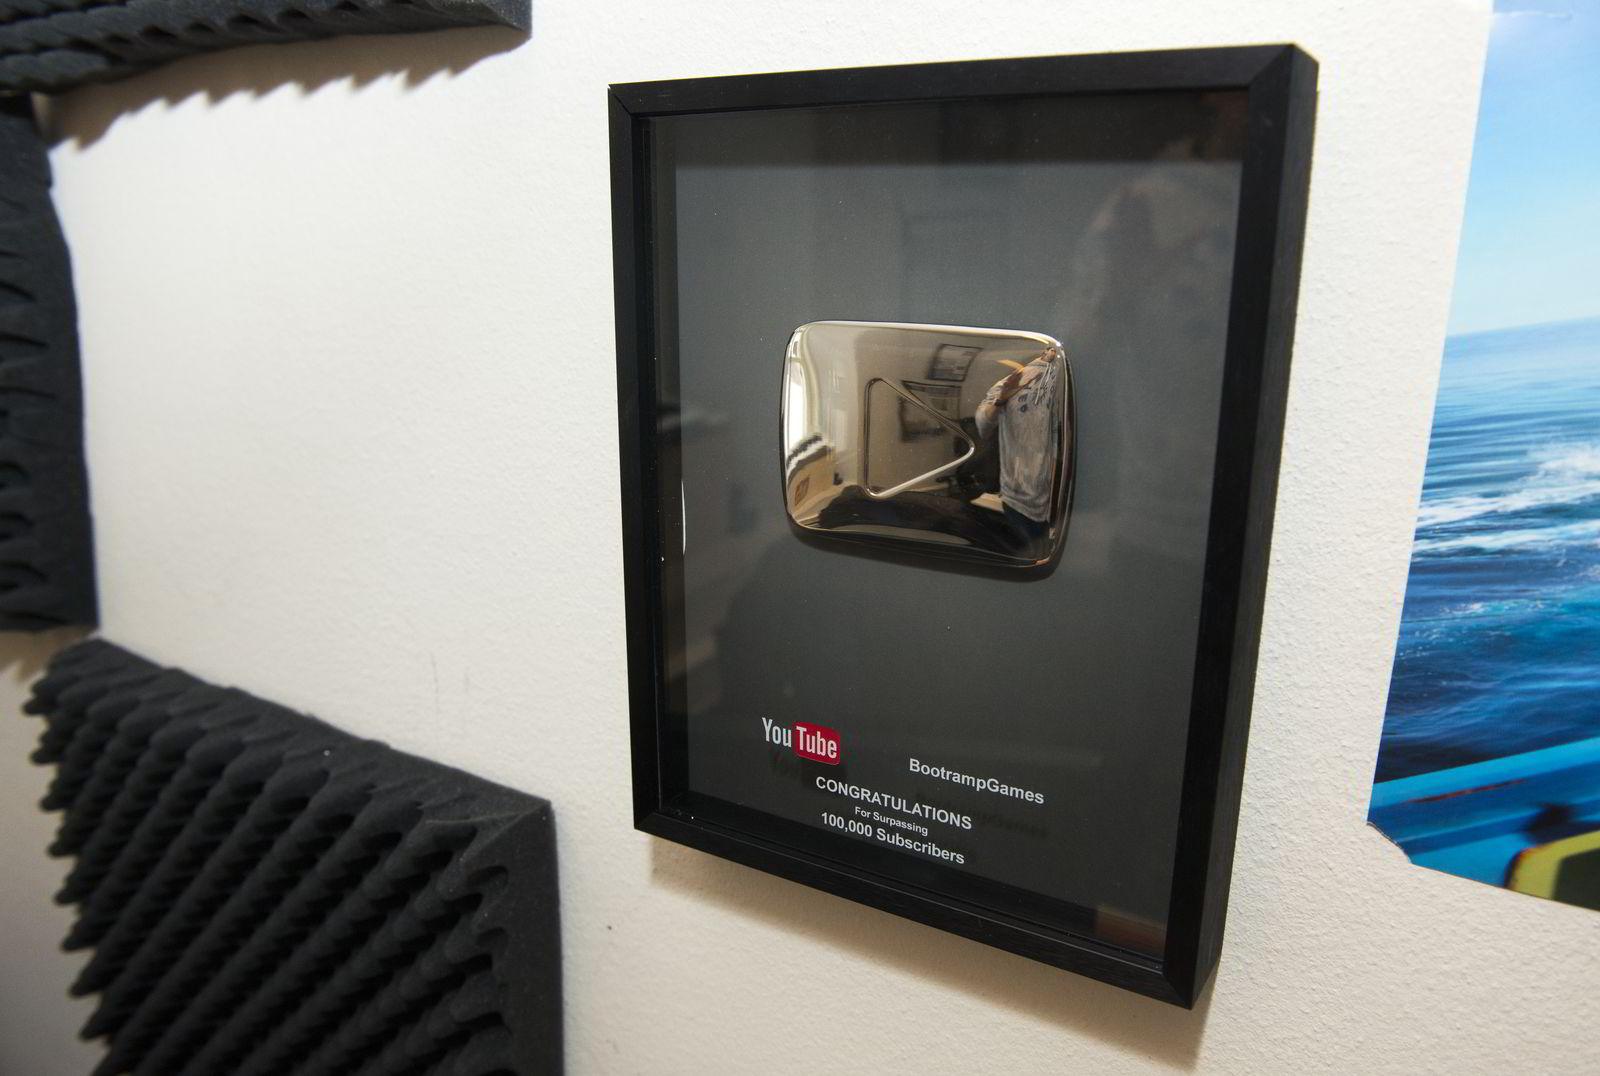 Plaketten Arciolla fikk fra Youtube da han rundet 100.000 abonnenter.